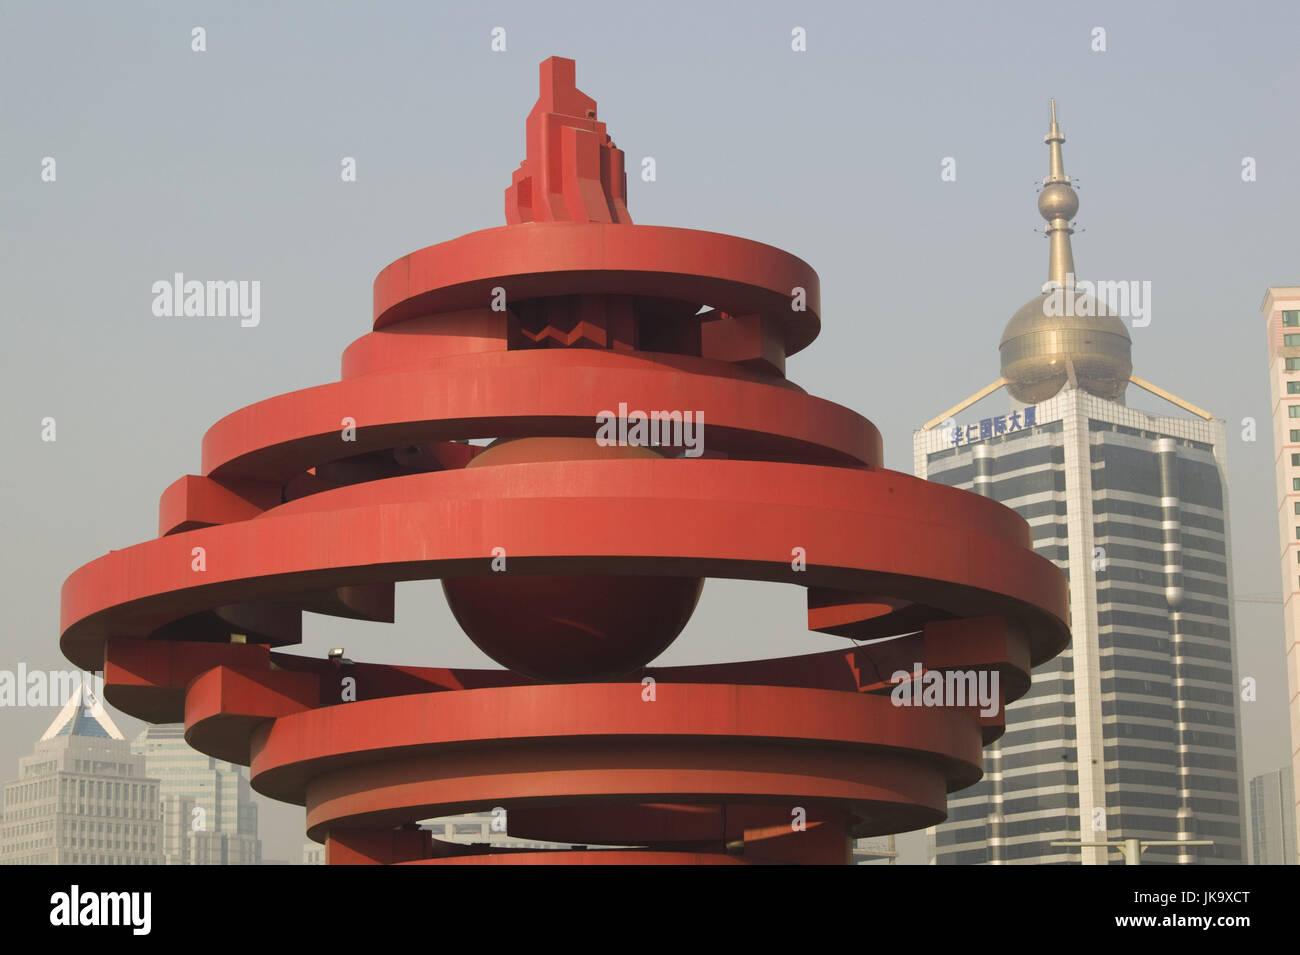 China, Qingdao, Xianggang Xilu,  Wusi Monument,   Asien, Ostasien, Stadt, Hochhäuser, Denkmal, Kunstwerk, Kunst, - Stock Image